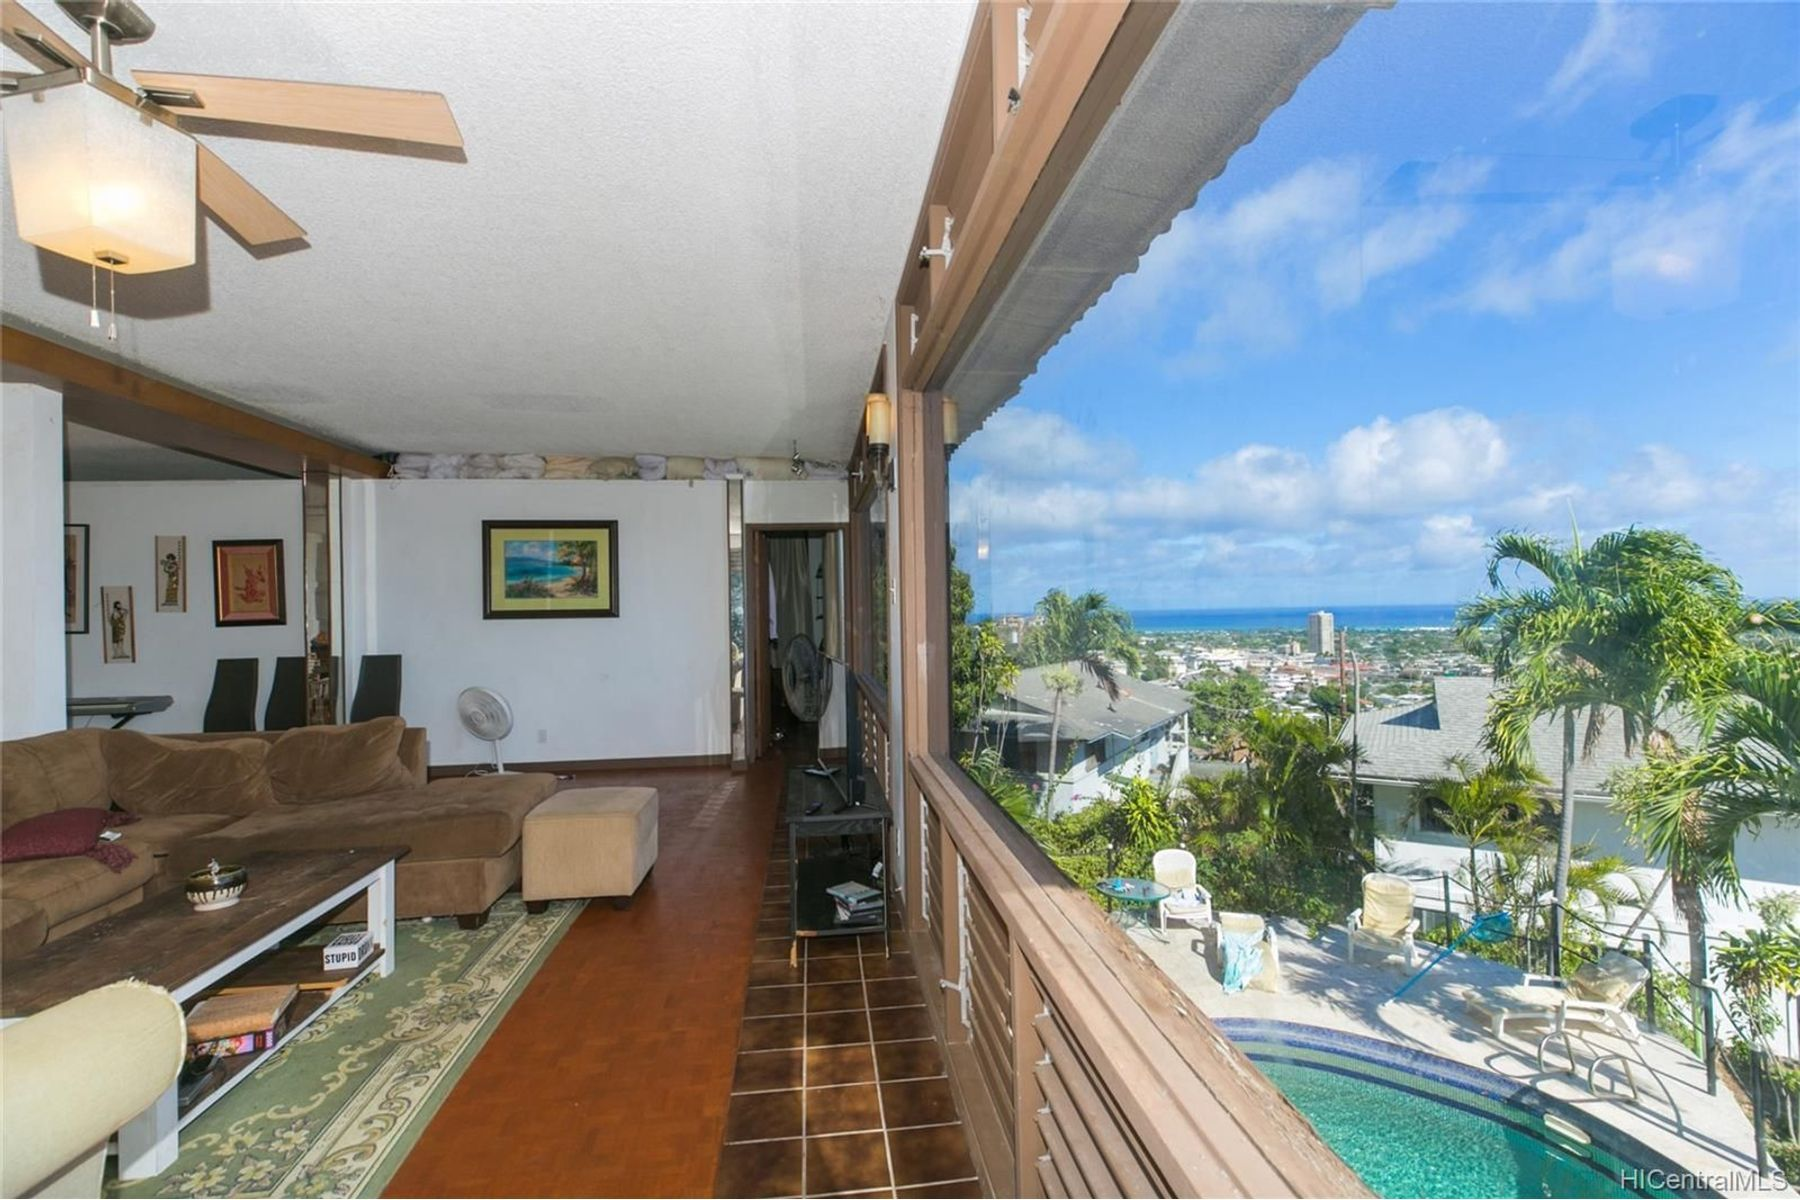 Oahu Properties For Sale Oahu Real Estate For Sale Oahu Condos Apartments Oahu Property Mls Listings Sear Hawaii Apartment Hawaii Homes Hawaii Real Estate